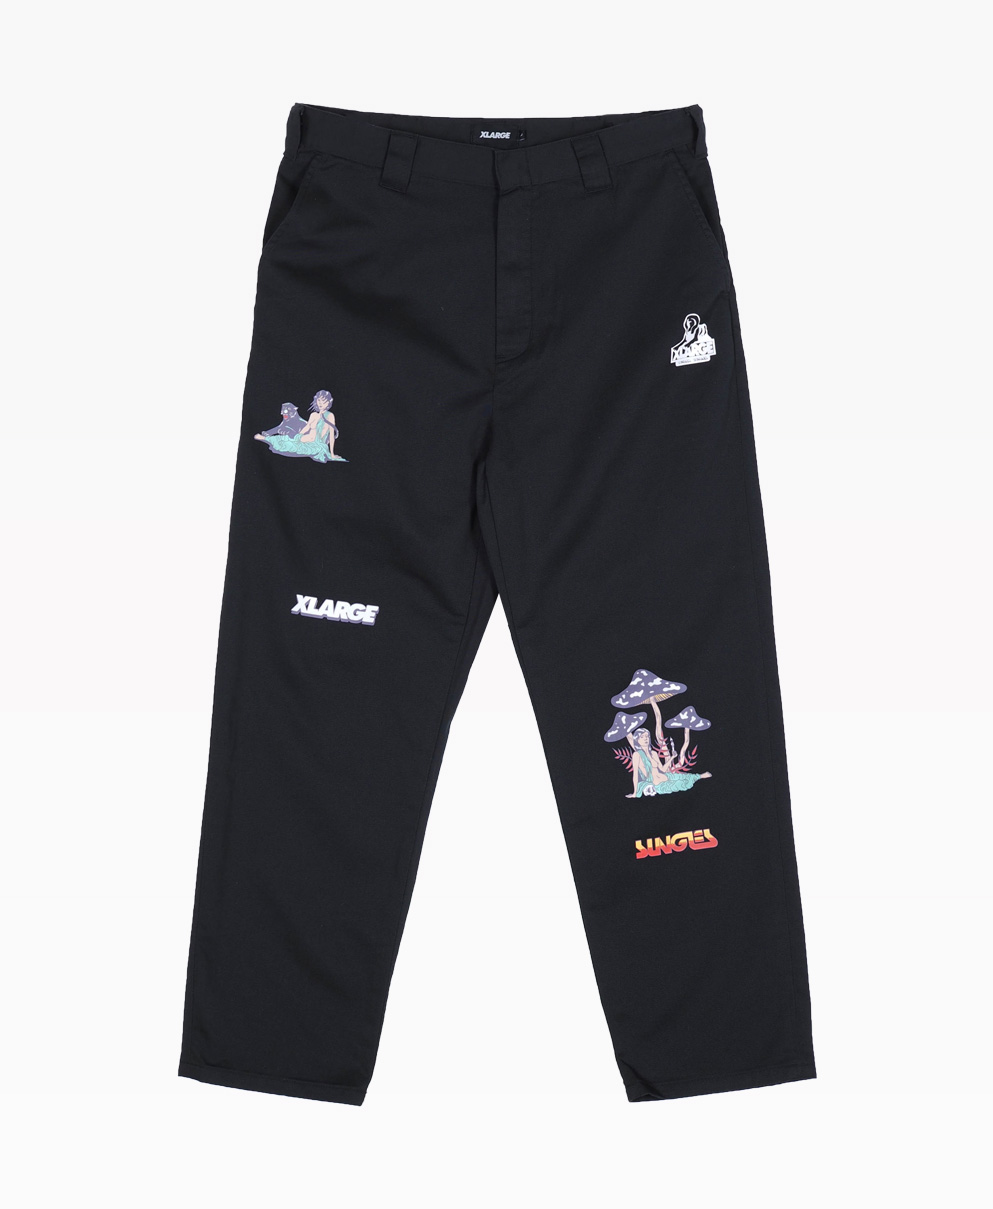 Jungles X Xlarge 91 Workwear Pants Front